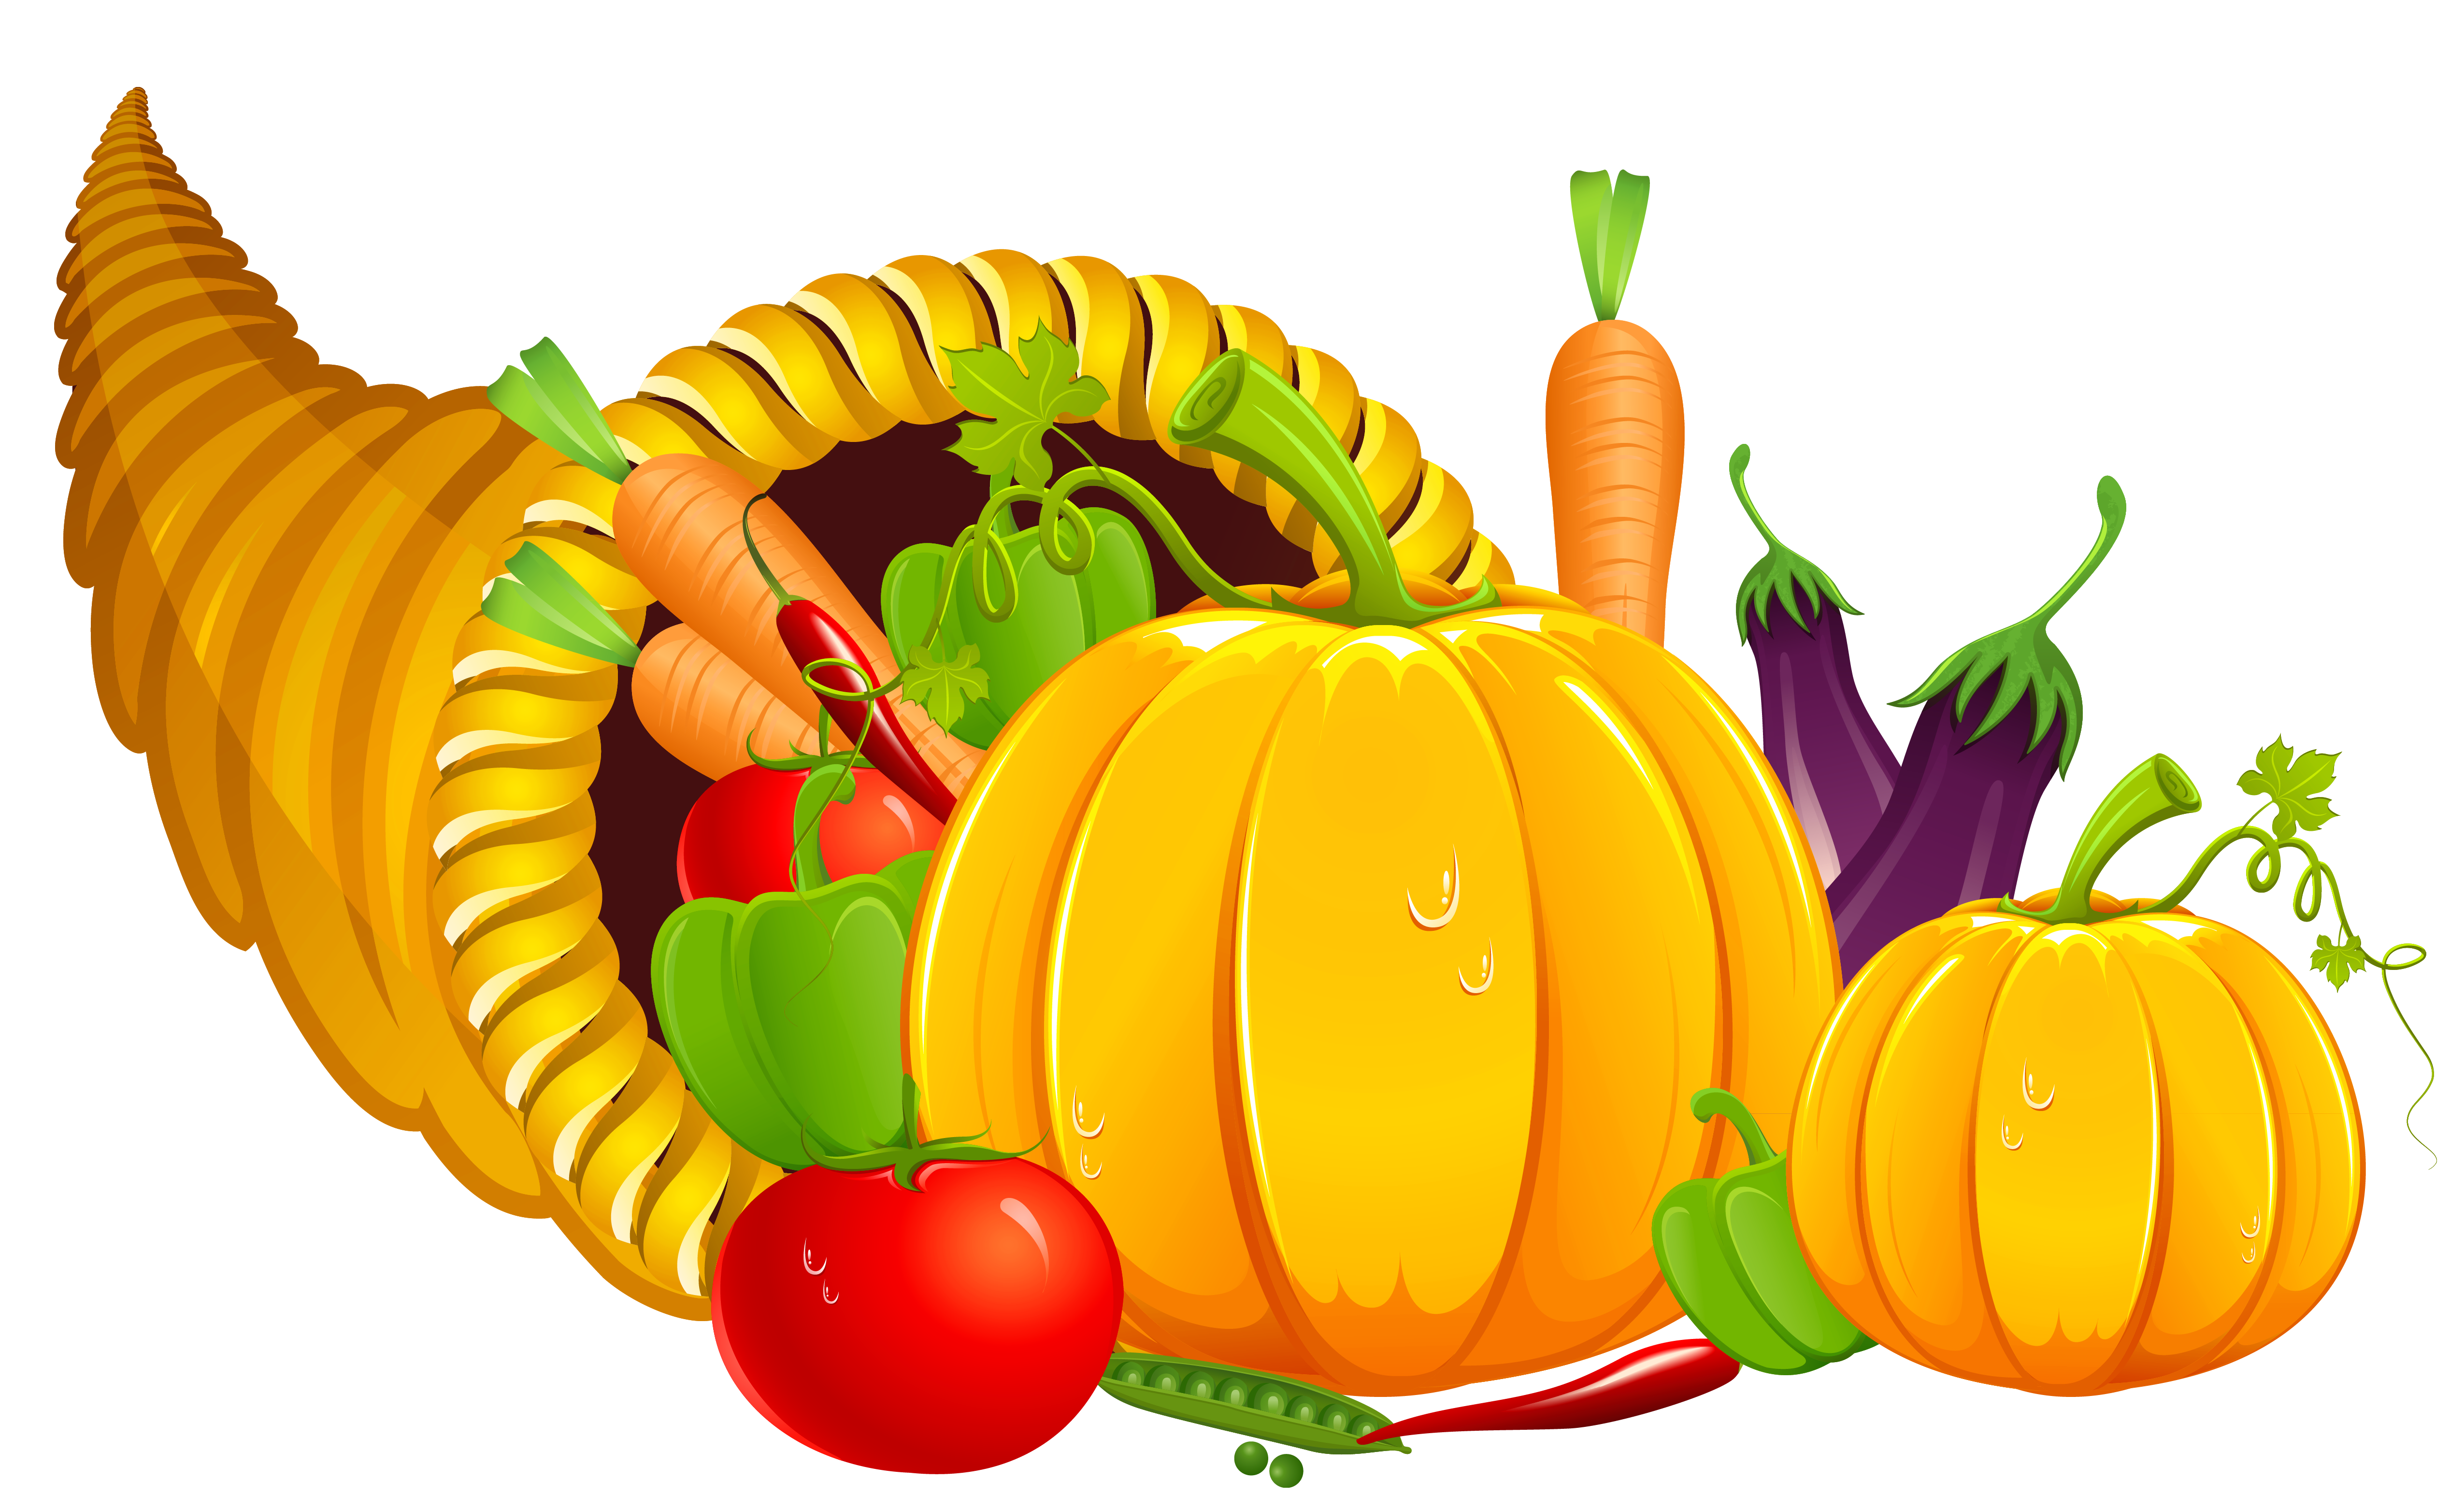 Basket Of Vegetables Clipart | Free download on ClipArtMag